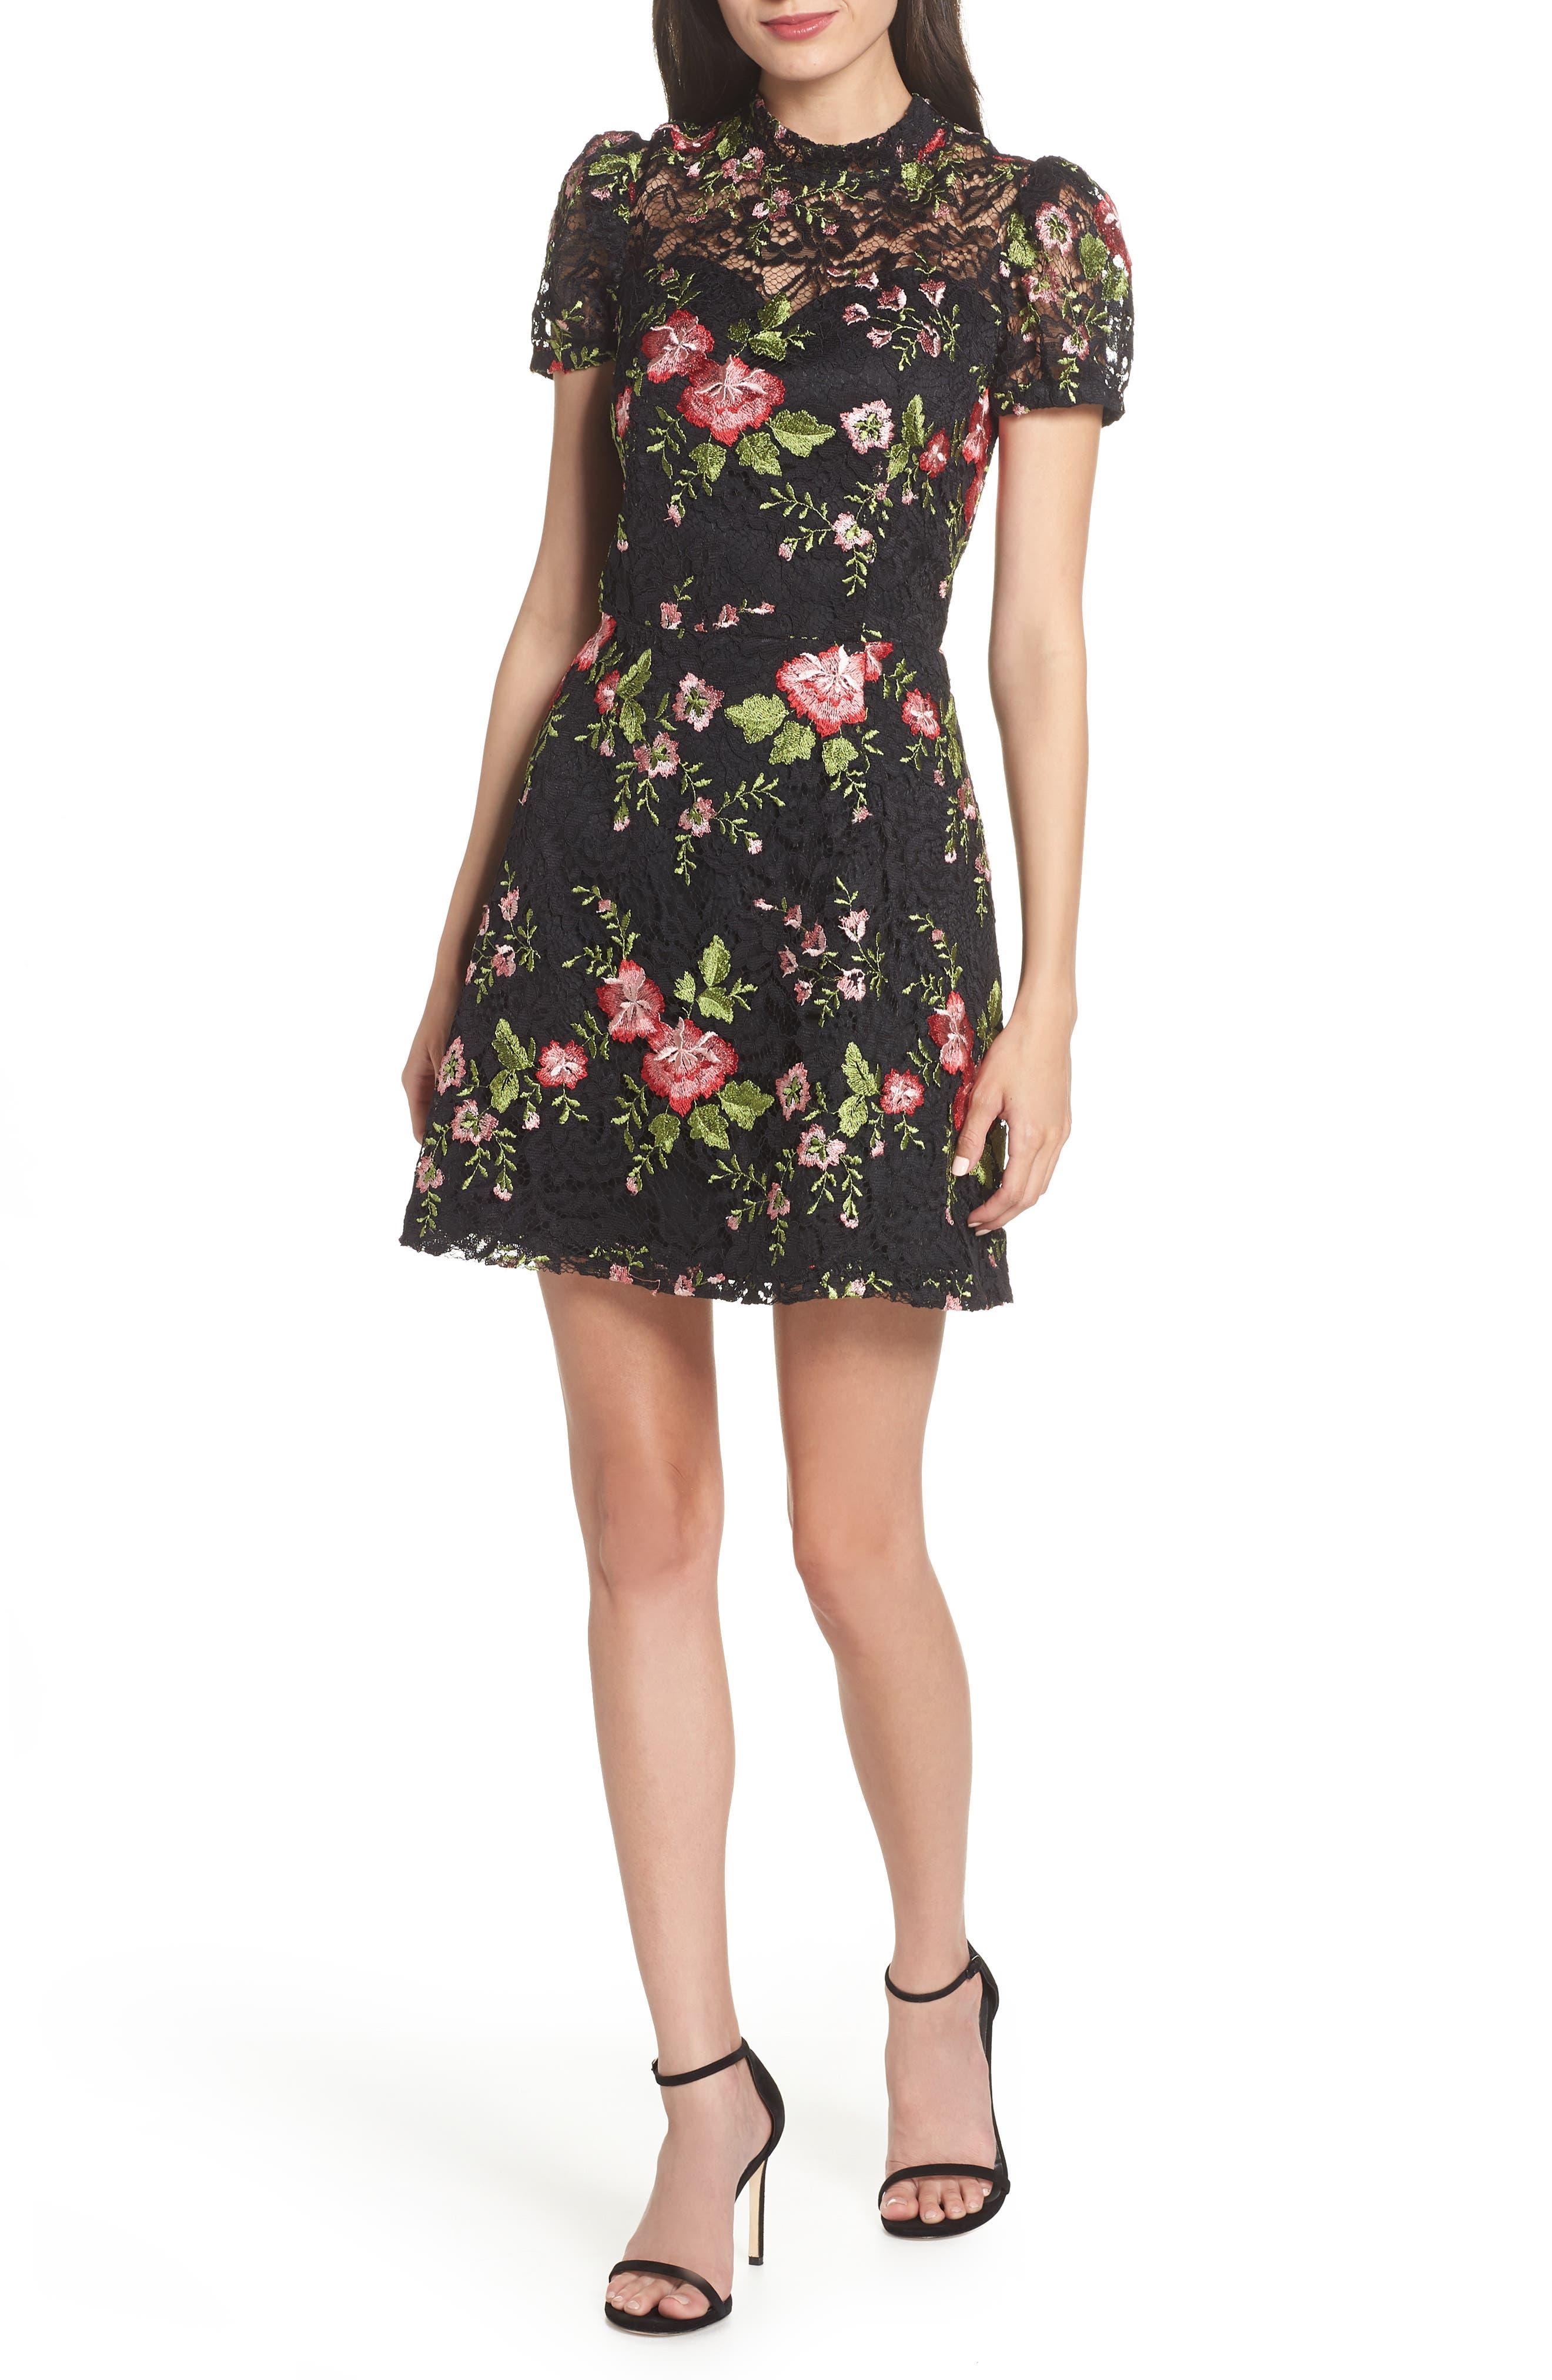 ADELYN RAE Maribel Lace Fit & Flare Dress in Black Multi